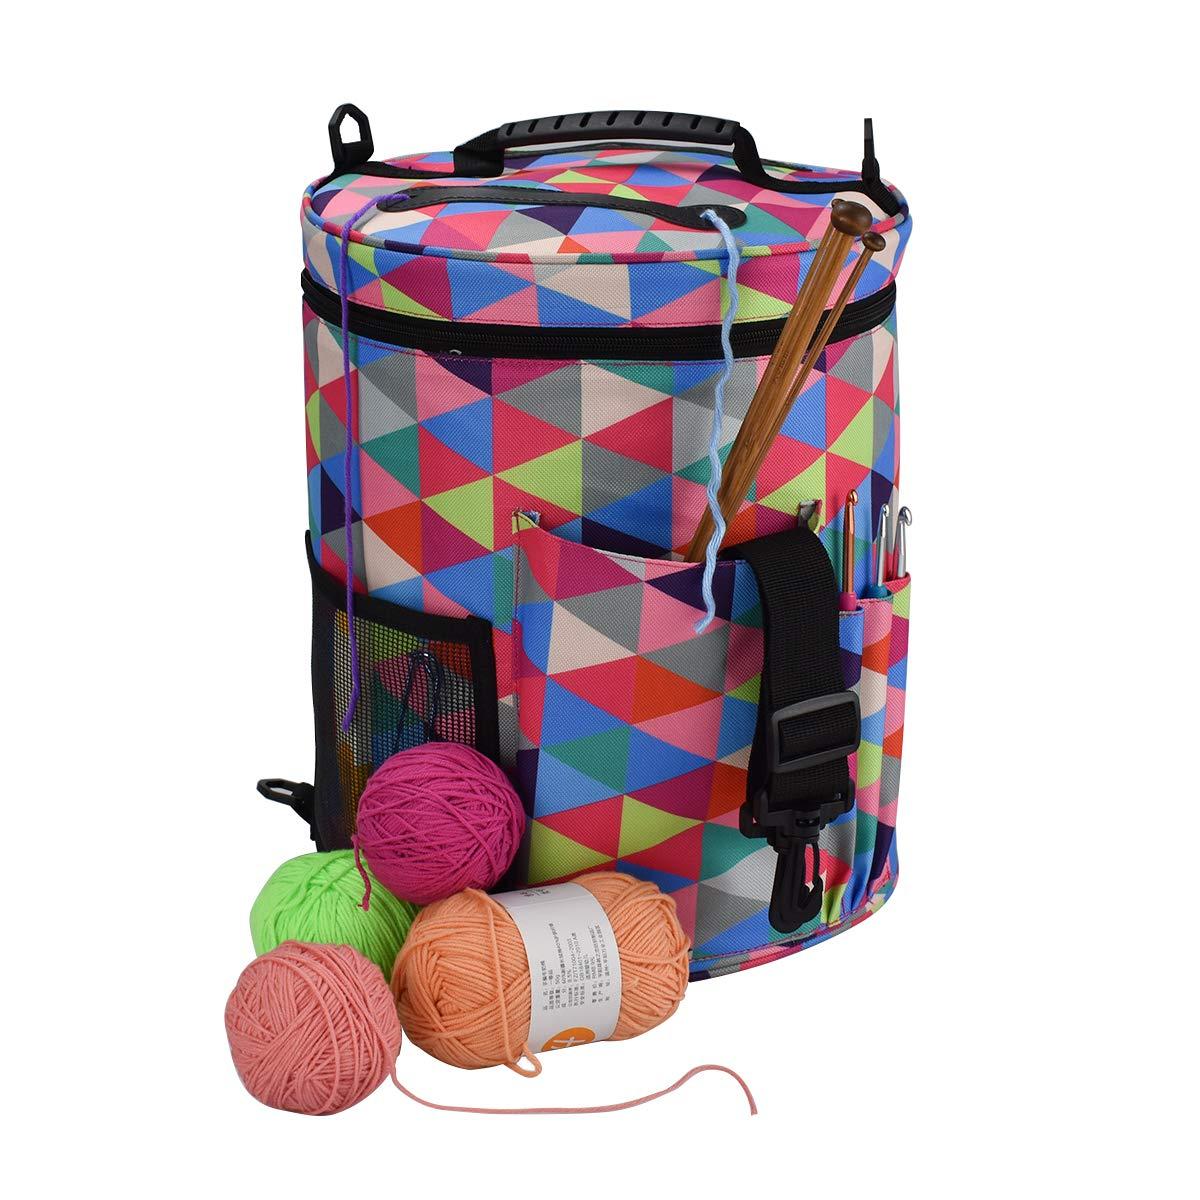 Yarn Bag Large Knitting Tote Bag Yarn Storage Tote for Yarn Large Tote Bag for Storage Yarn Supplies Organizer Tote for Weave Tools Crochet Accessories Needles/Hooks 【Cowhide】